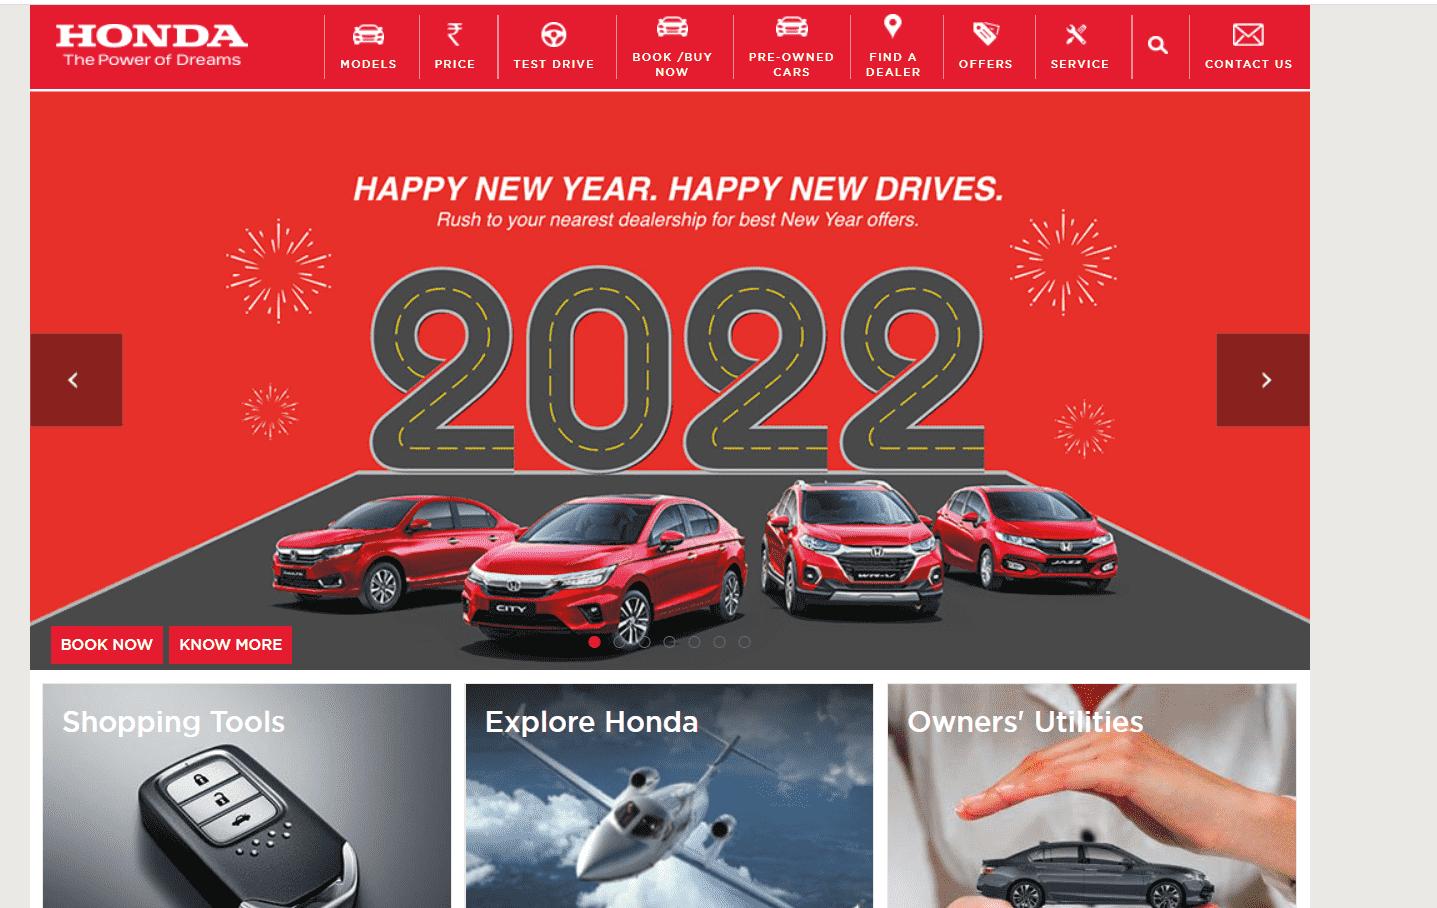 Honda Cars India reviews and complaints